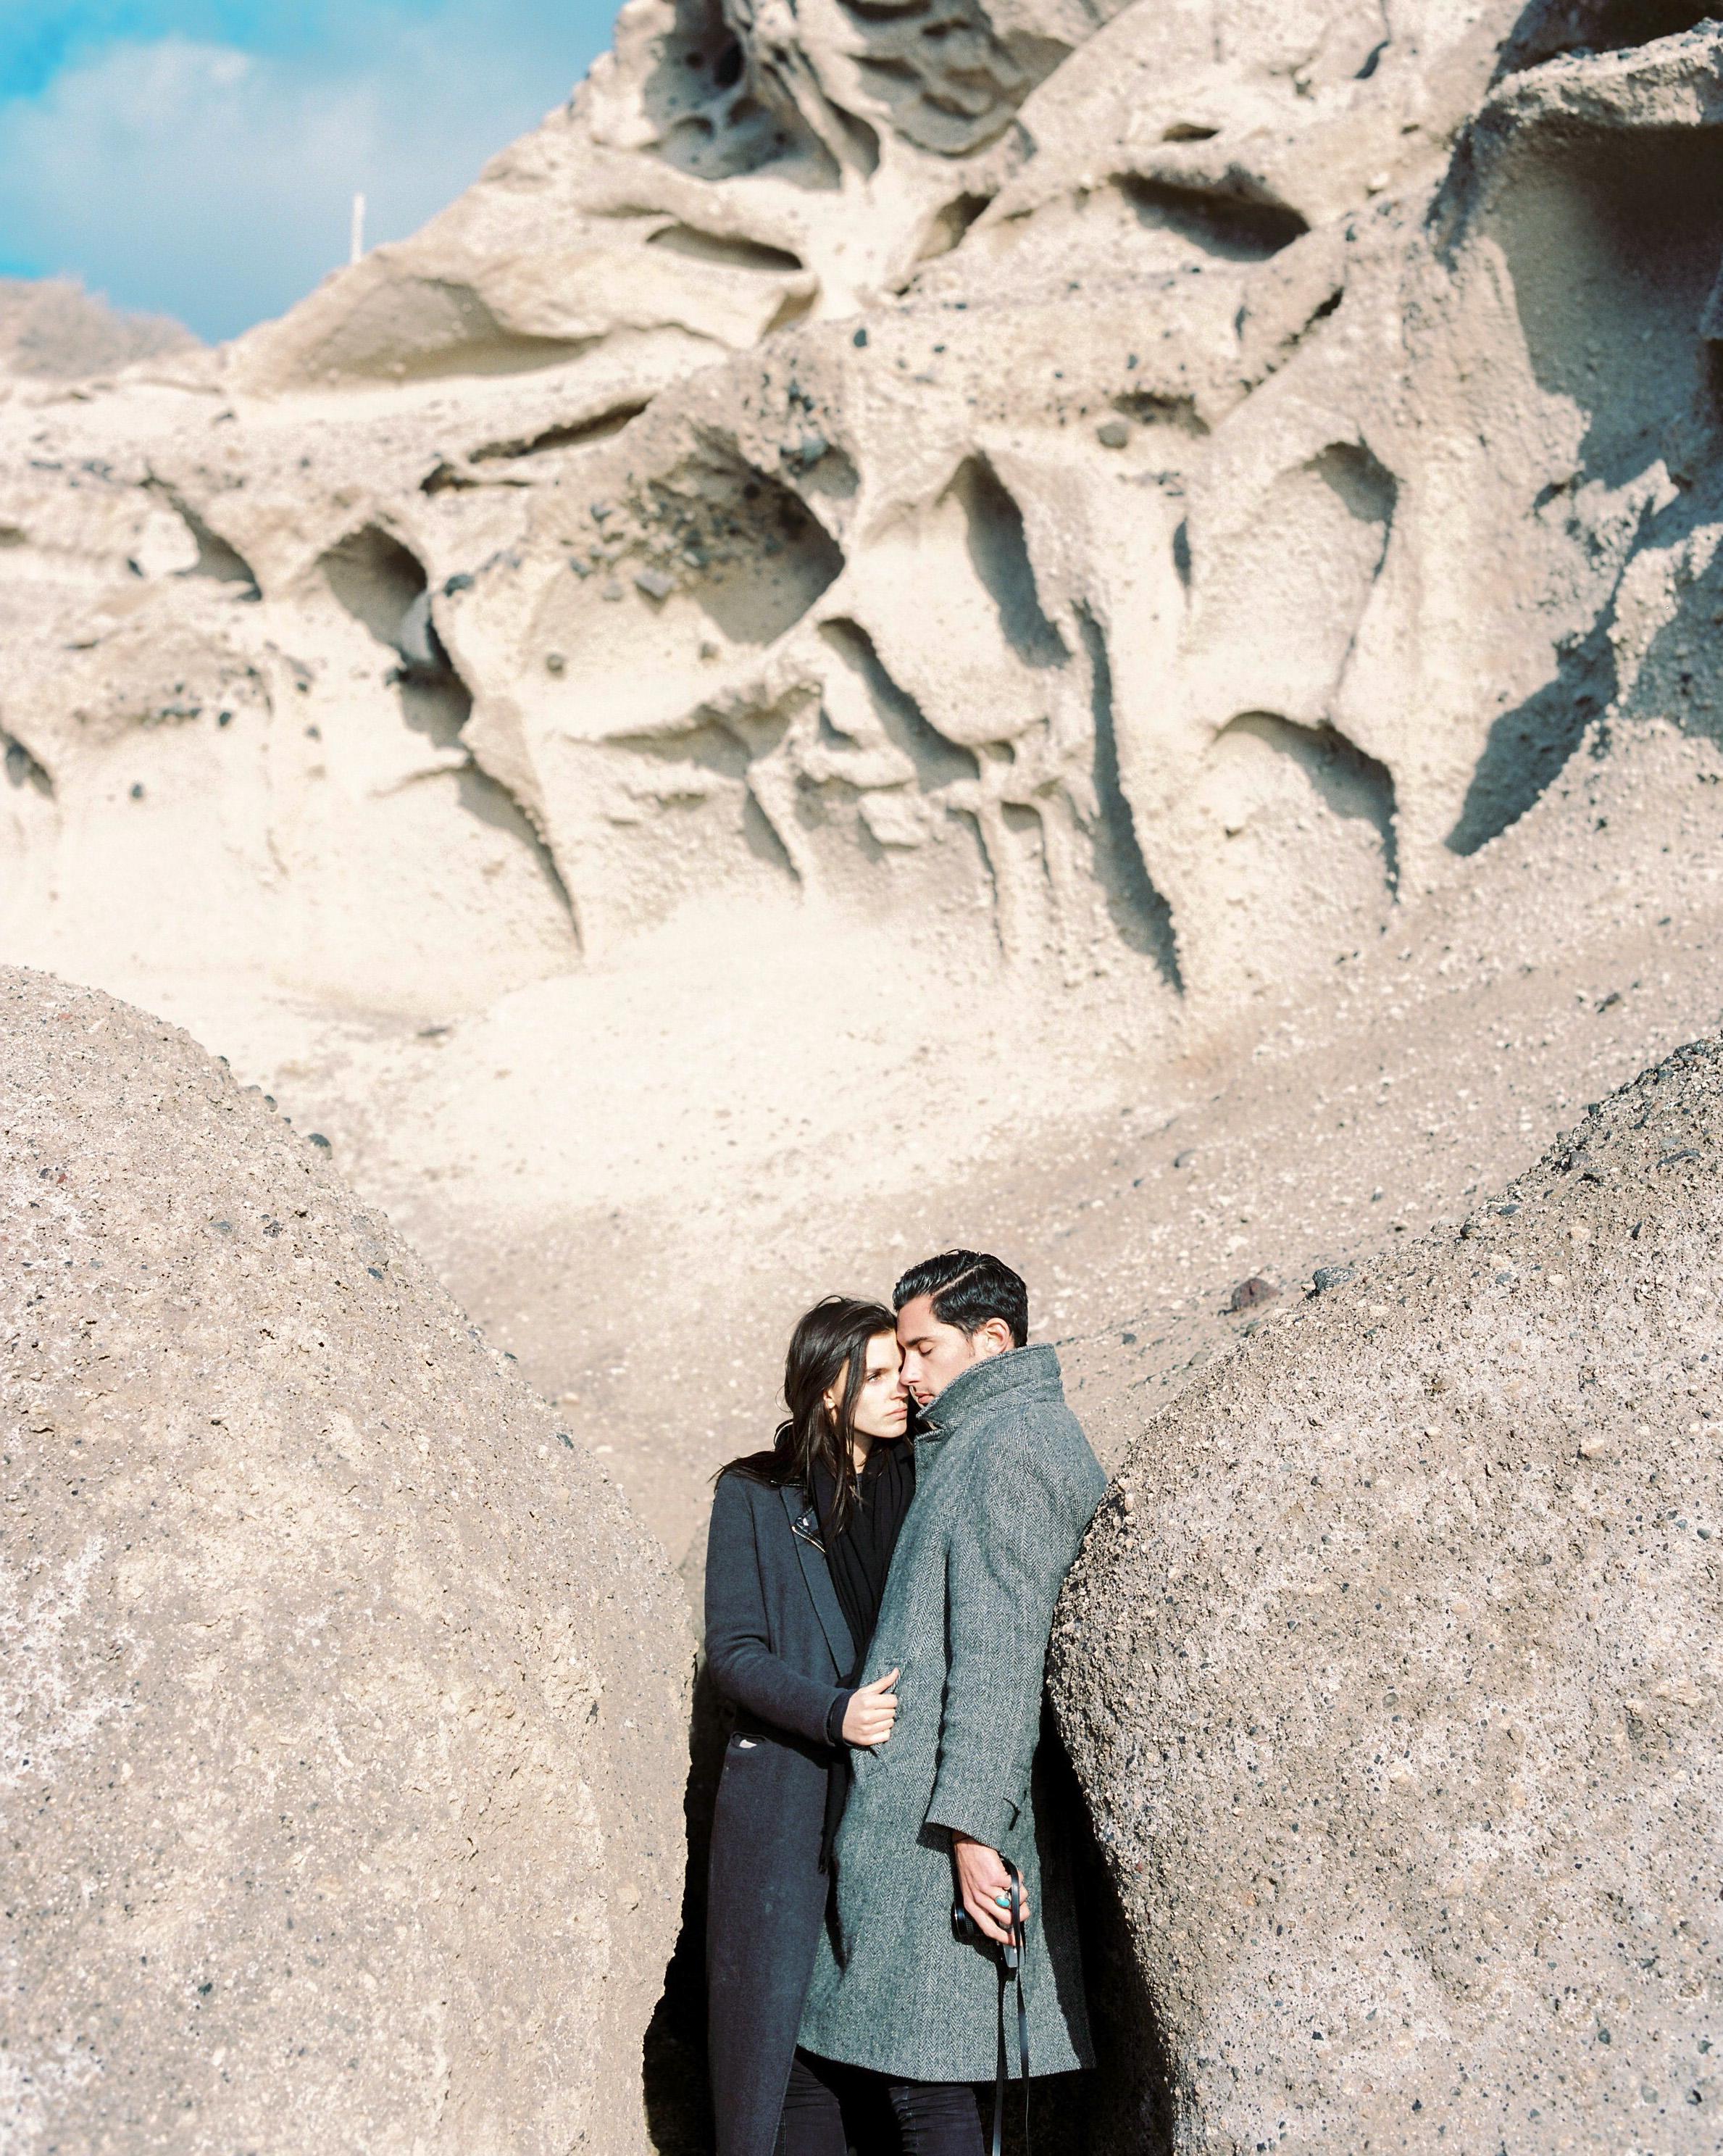 celinehamelin-photographe-couple-argentique-loversession-grece-santorin-argentique-filmphotography-greece13.jpg